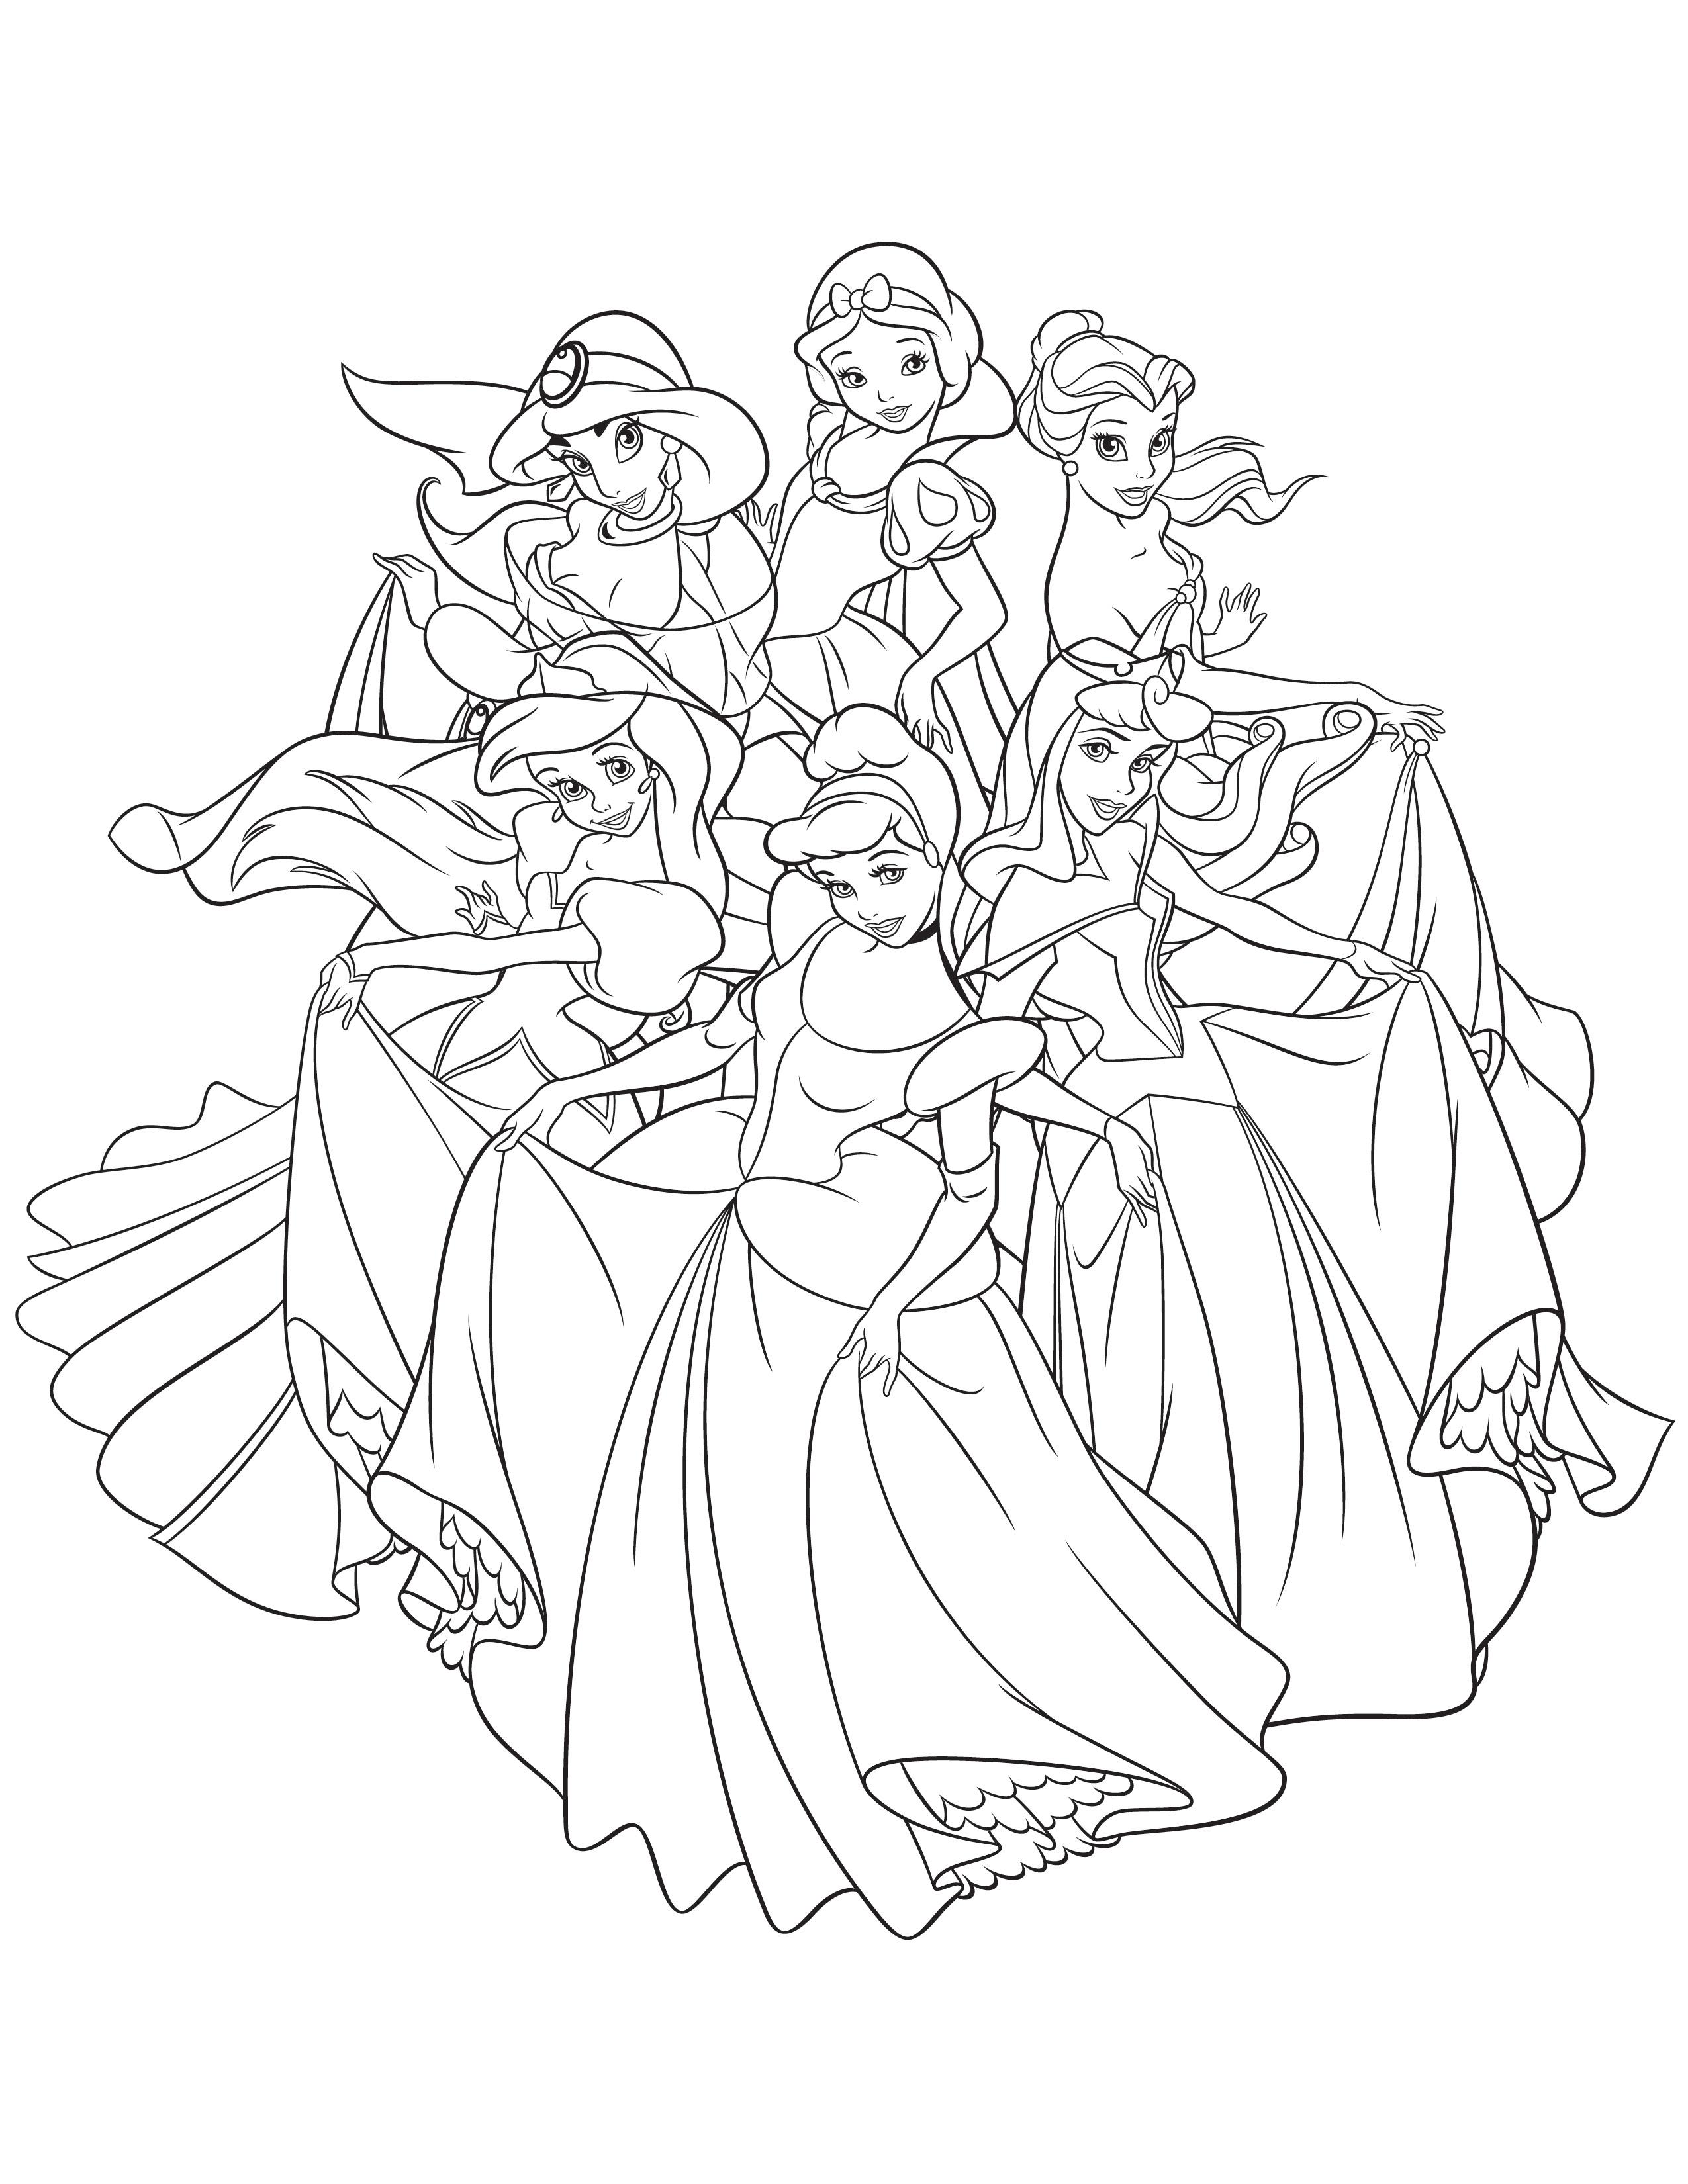 coloriage gratuit de princesse with coloriage gratuit de princesse